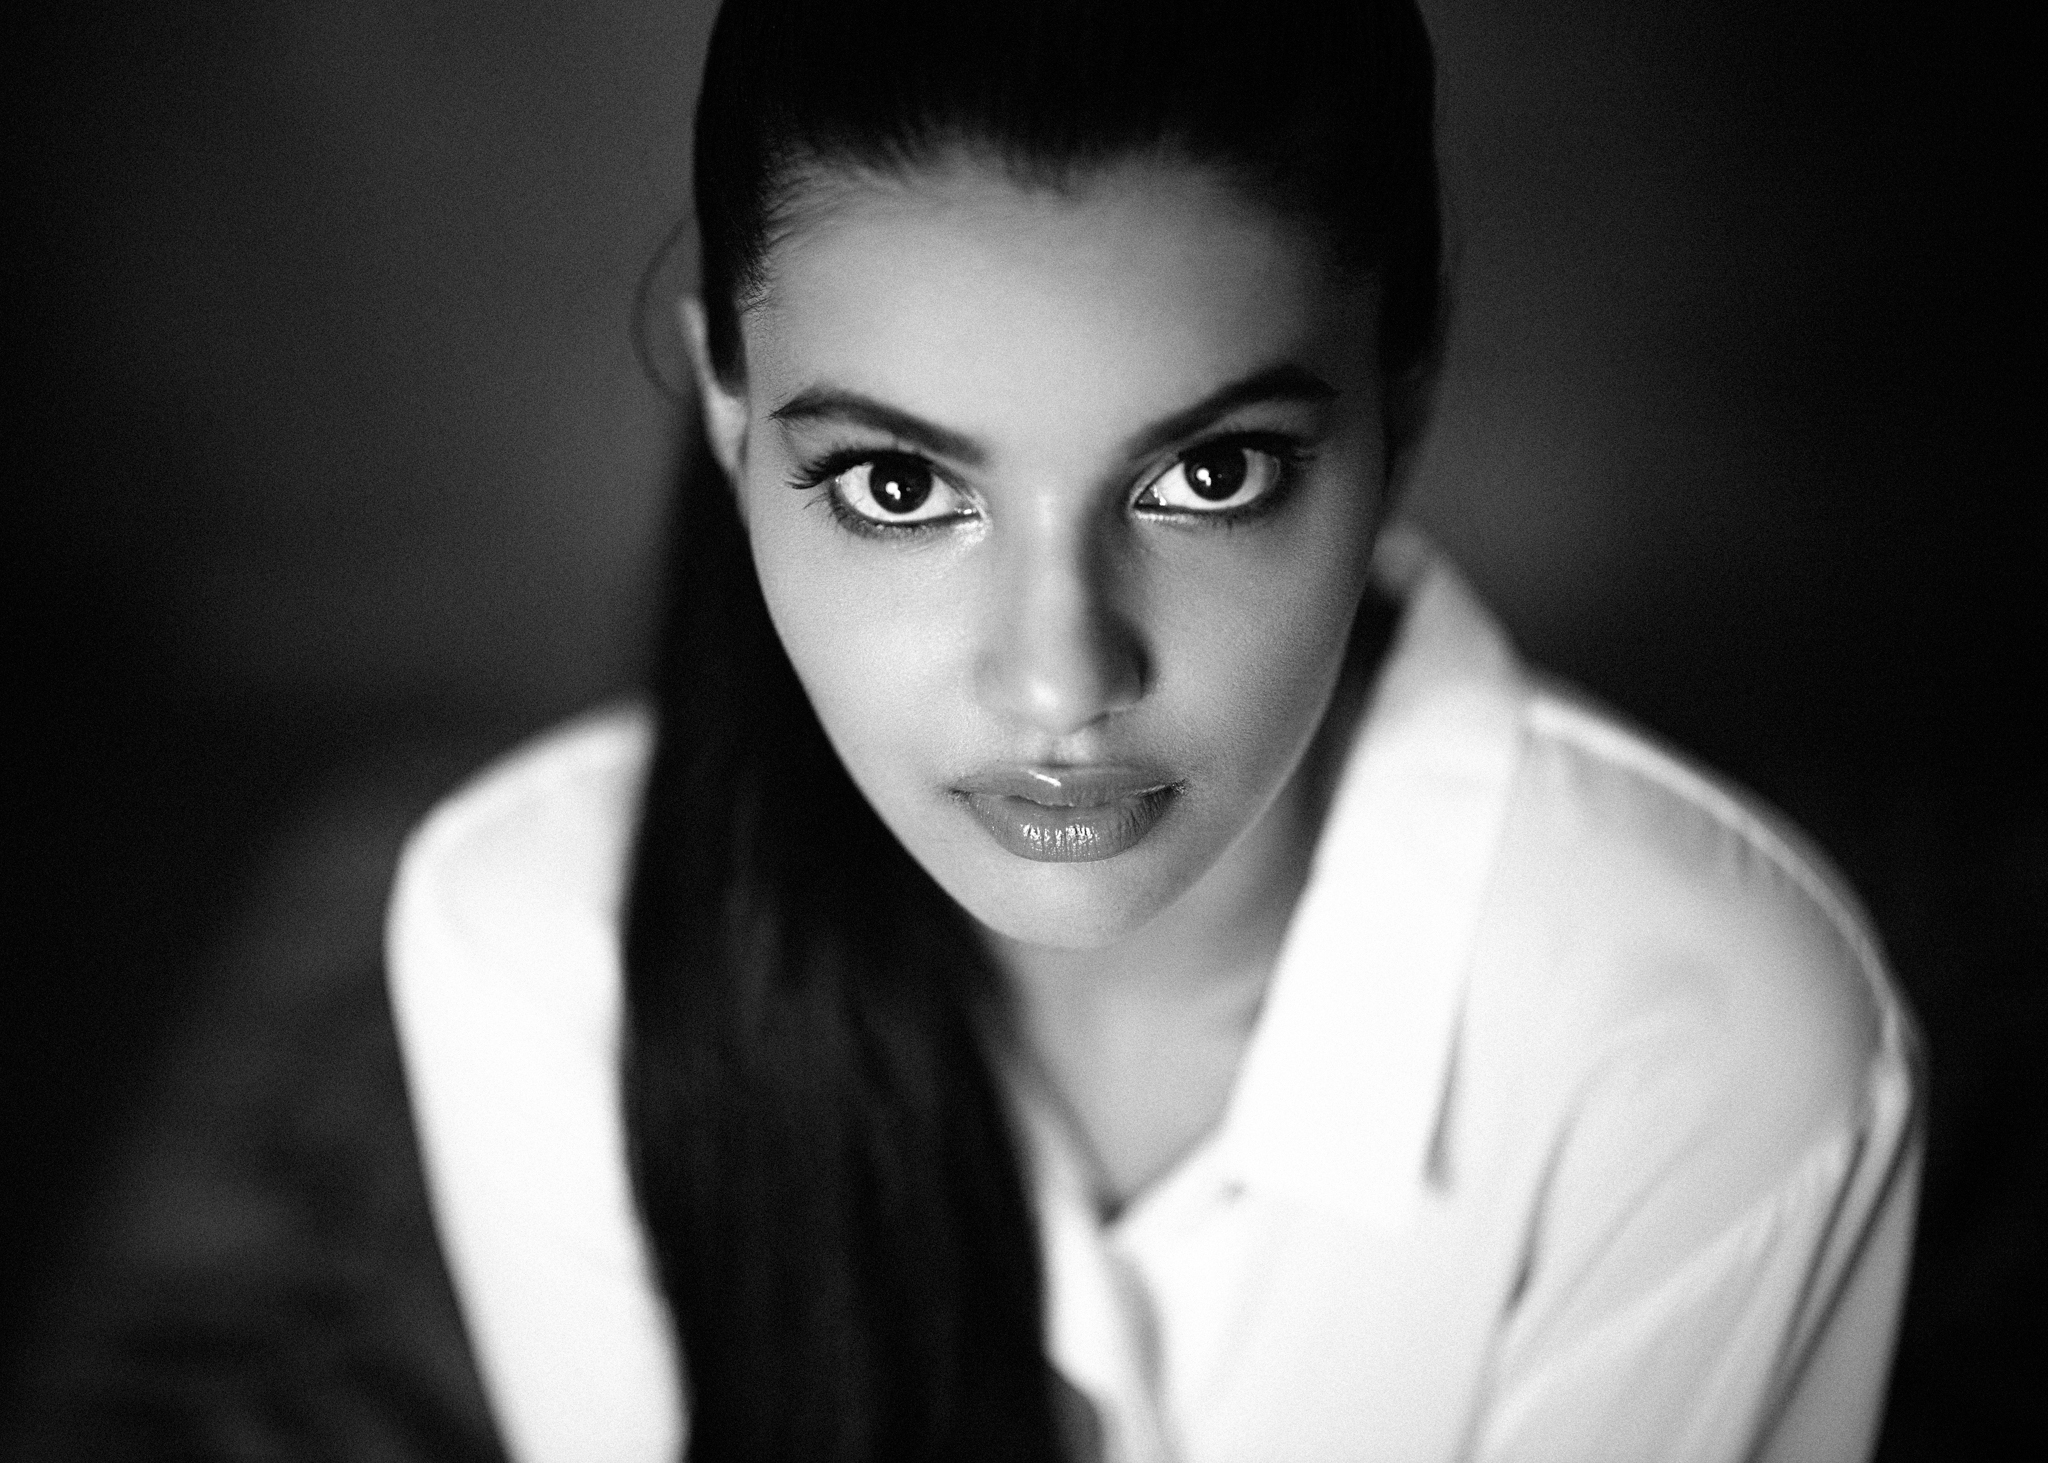 Richa Sinha